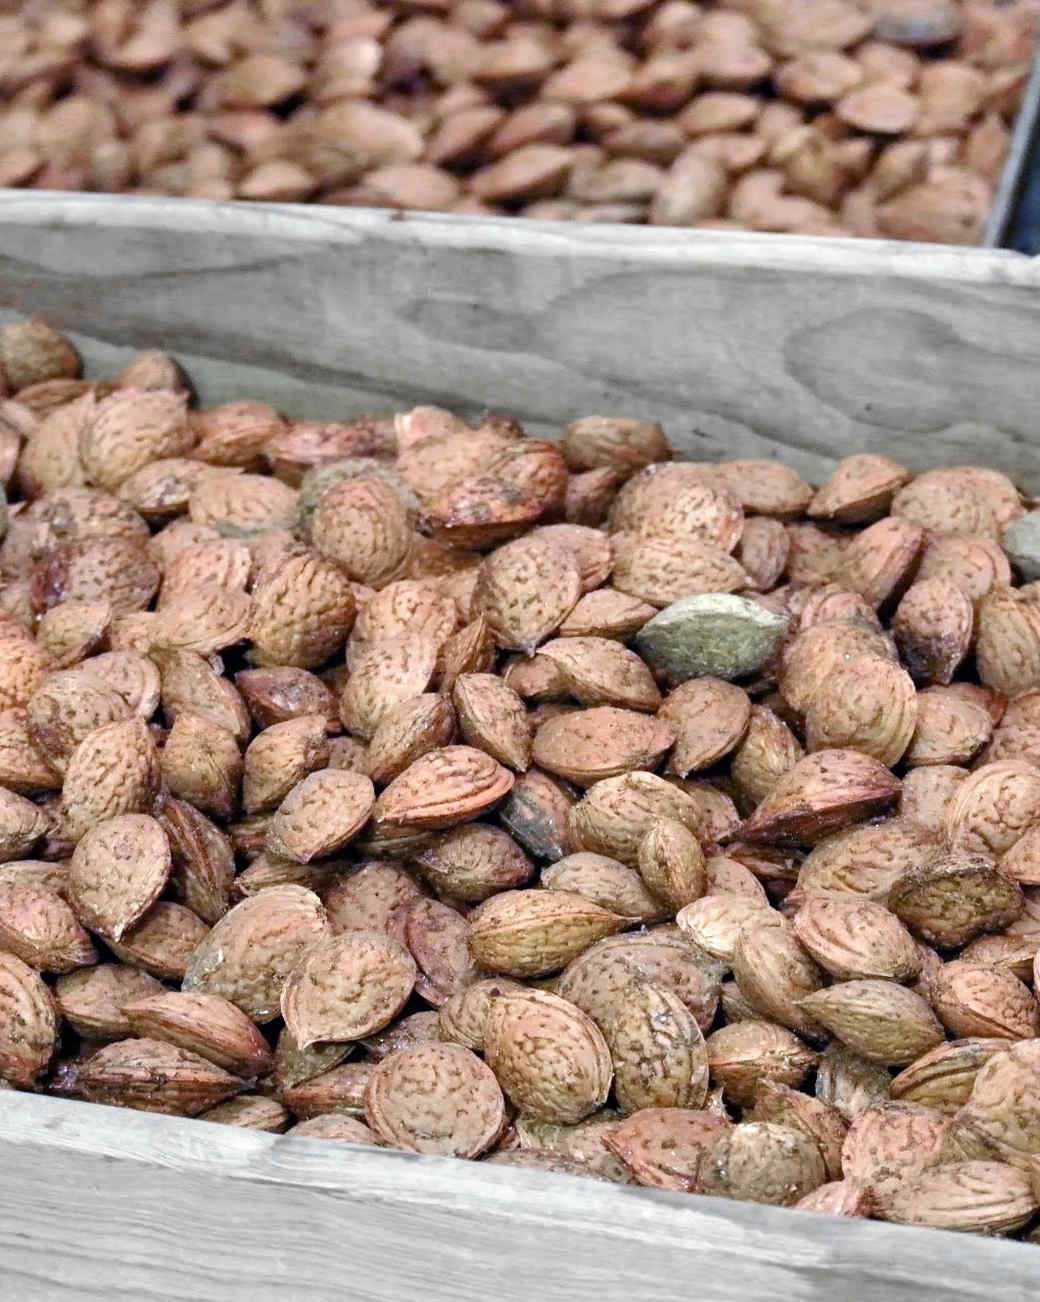 harvesting-almonds-21.jpg